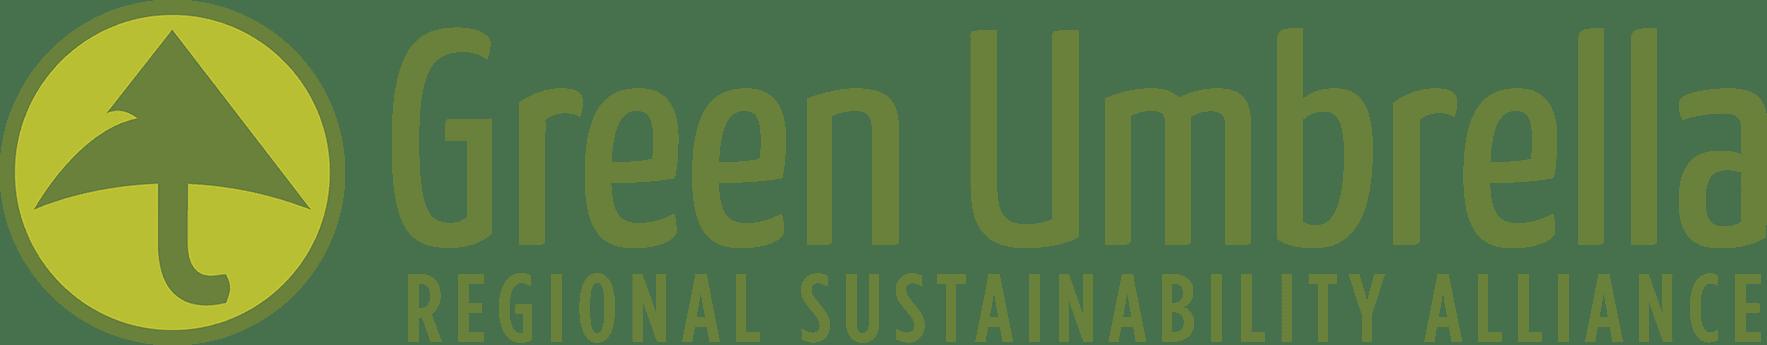 Green Umbrella Logo (opens in a new tab)